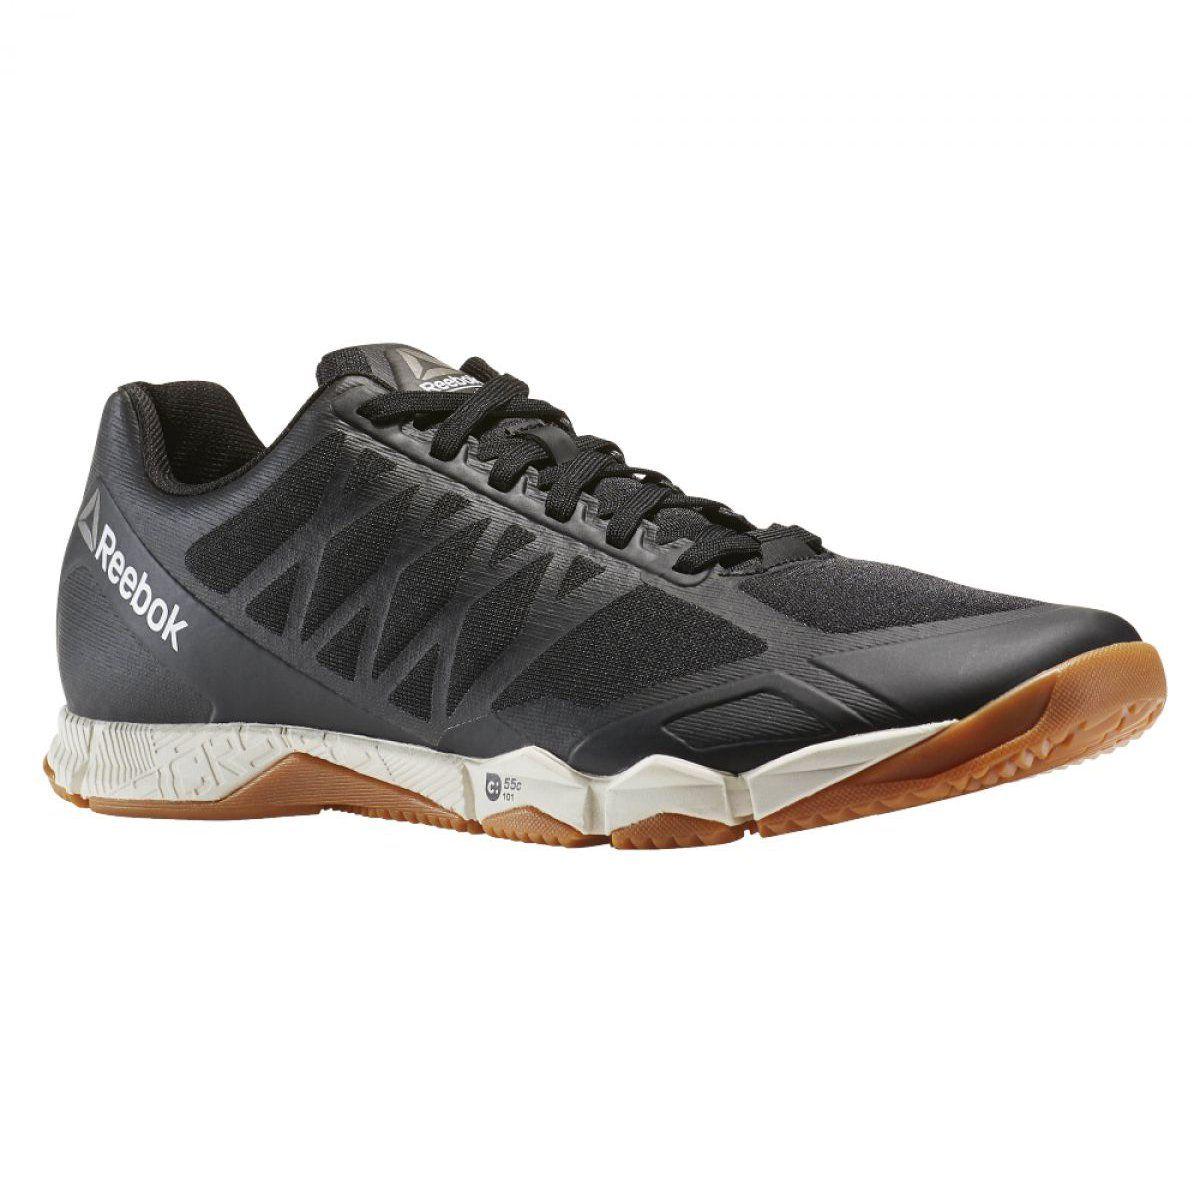 Buty Treningowe Reebok Crossfit Speed Tr M Bd5490 Czarne Reebok Crossfit Womens Crossfit Shoes Crossfit Shoes